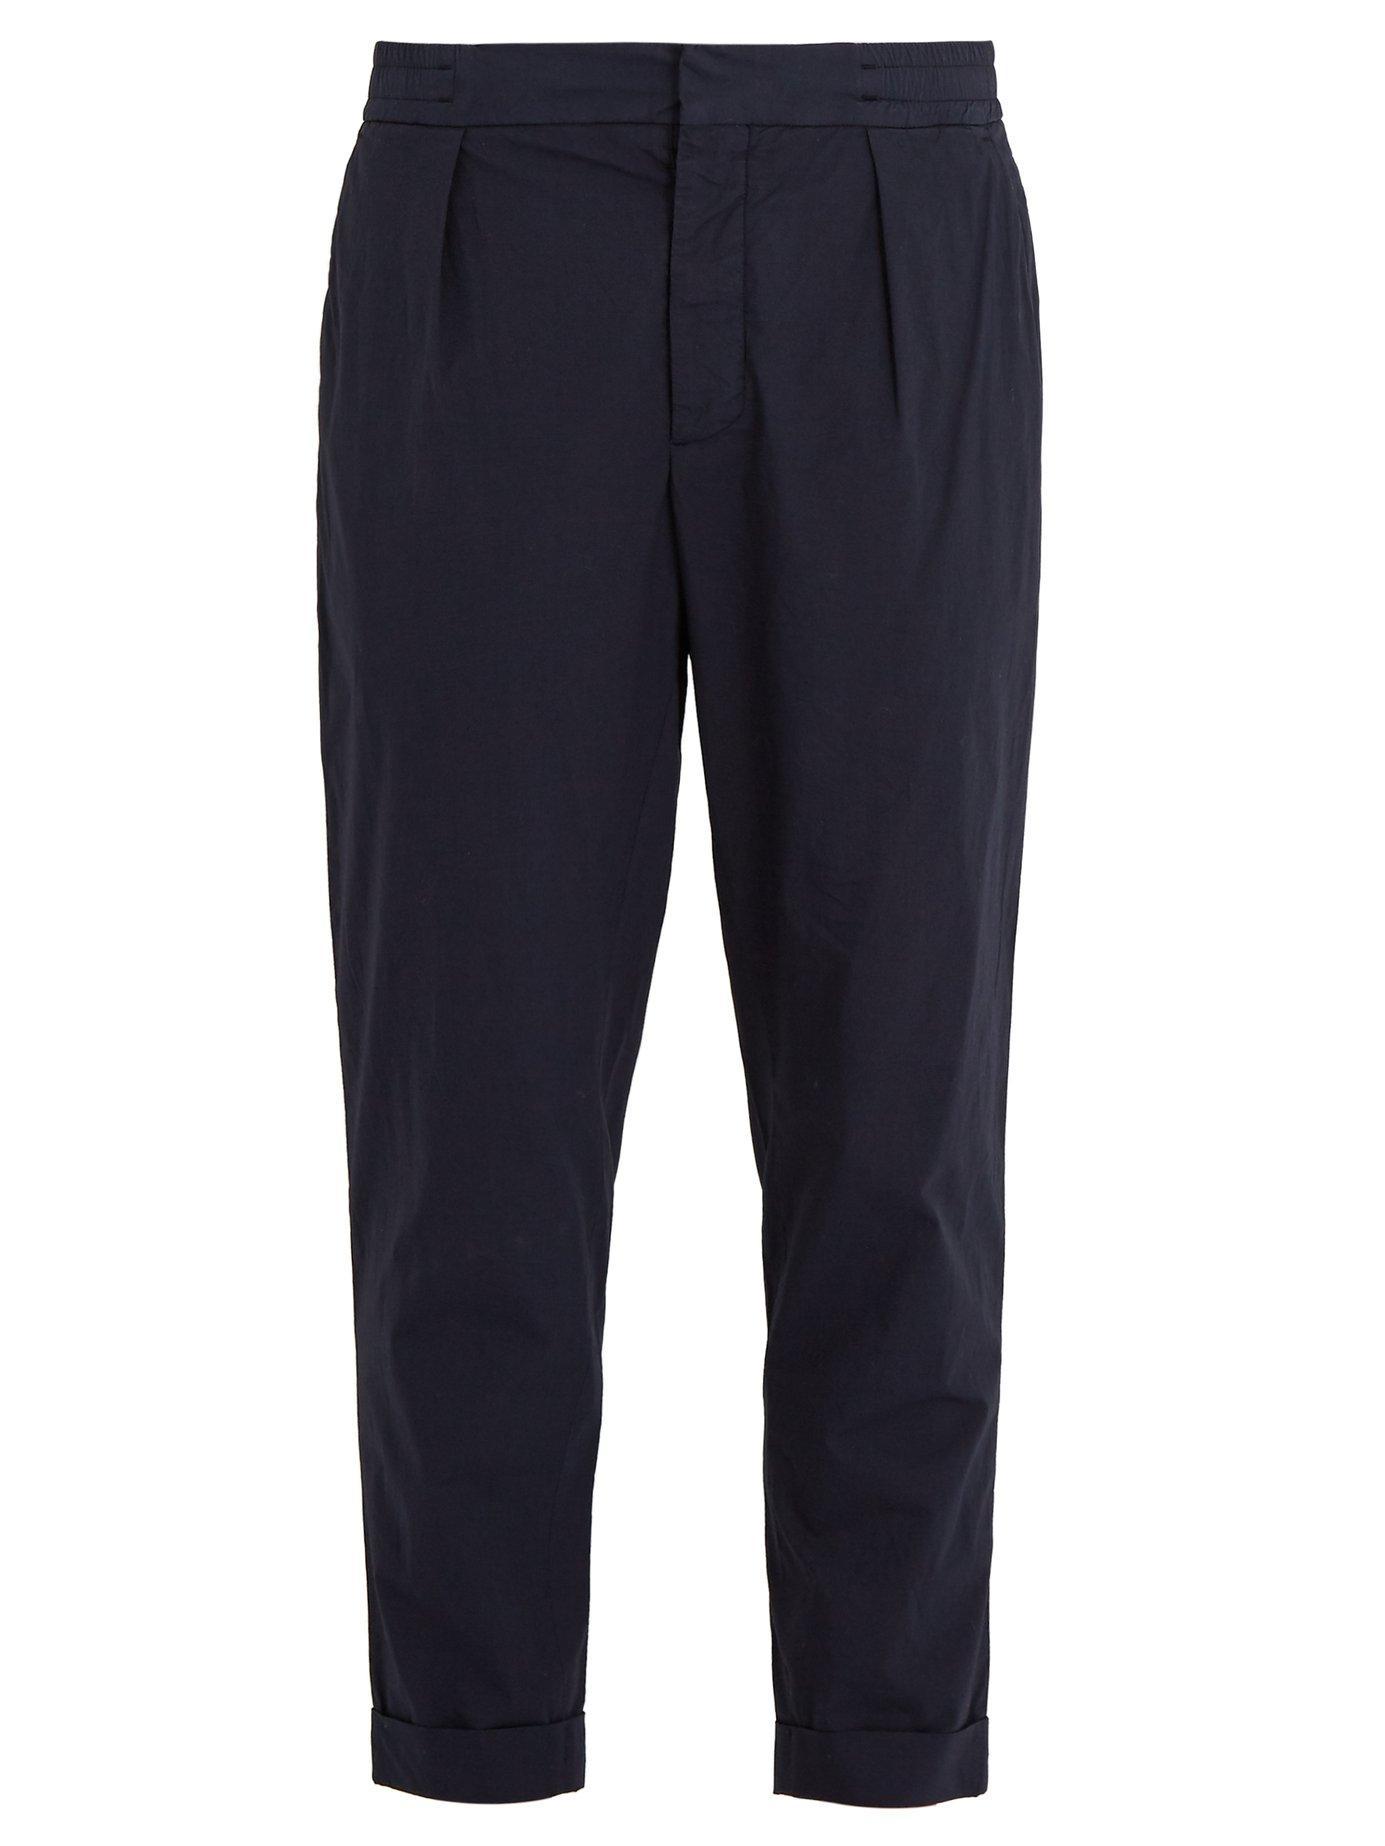 Barena Venezia Scaleter Virgin Wool-blend Track Pants In Navy